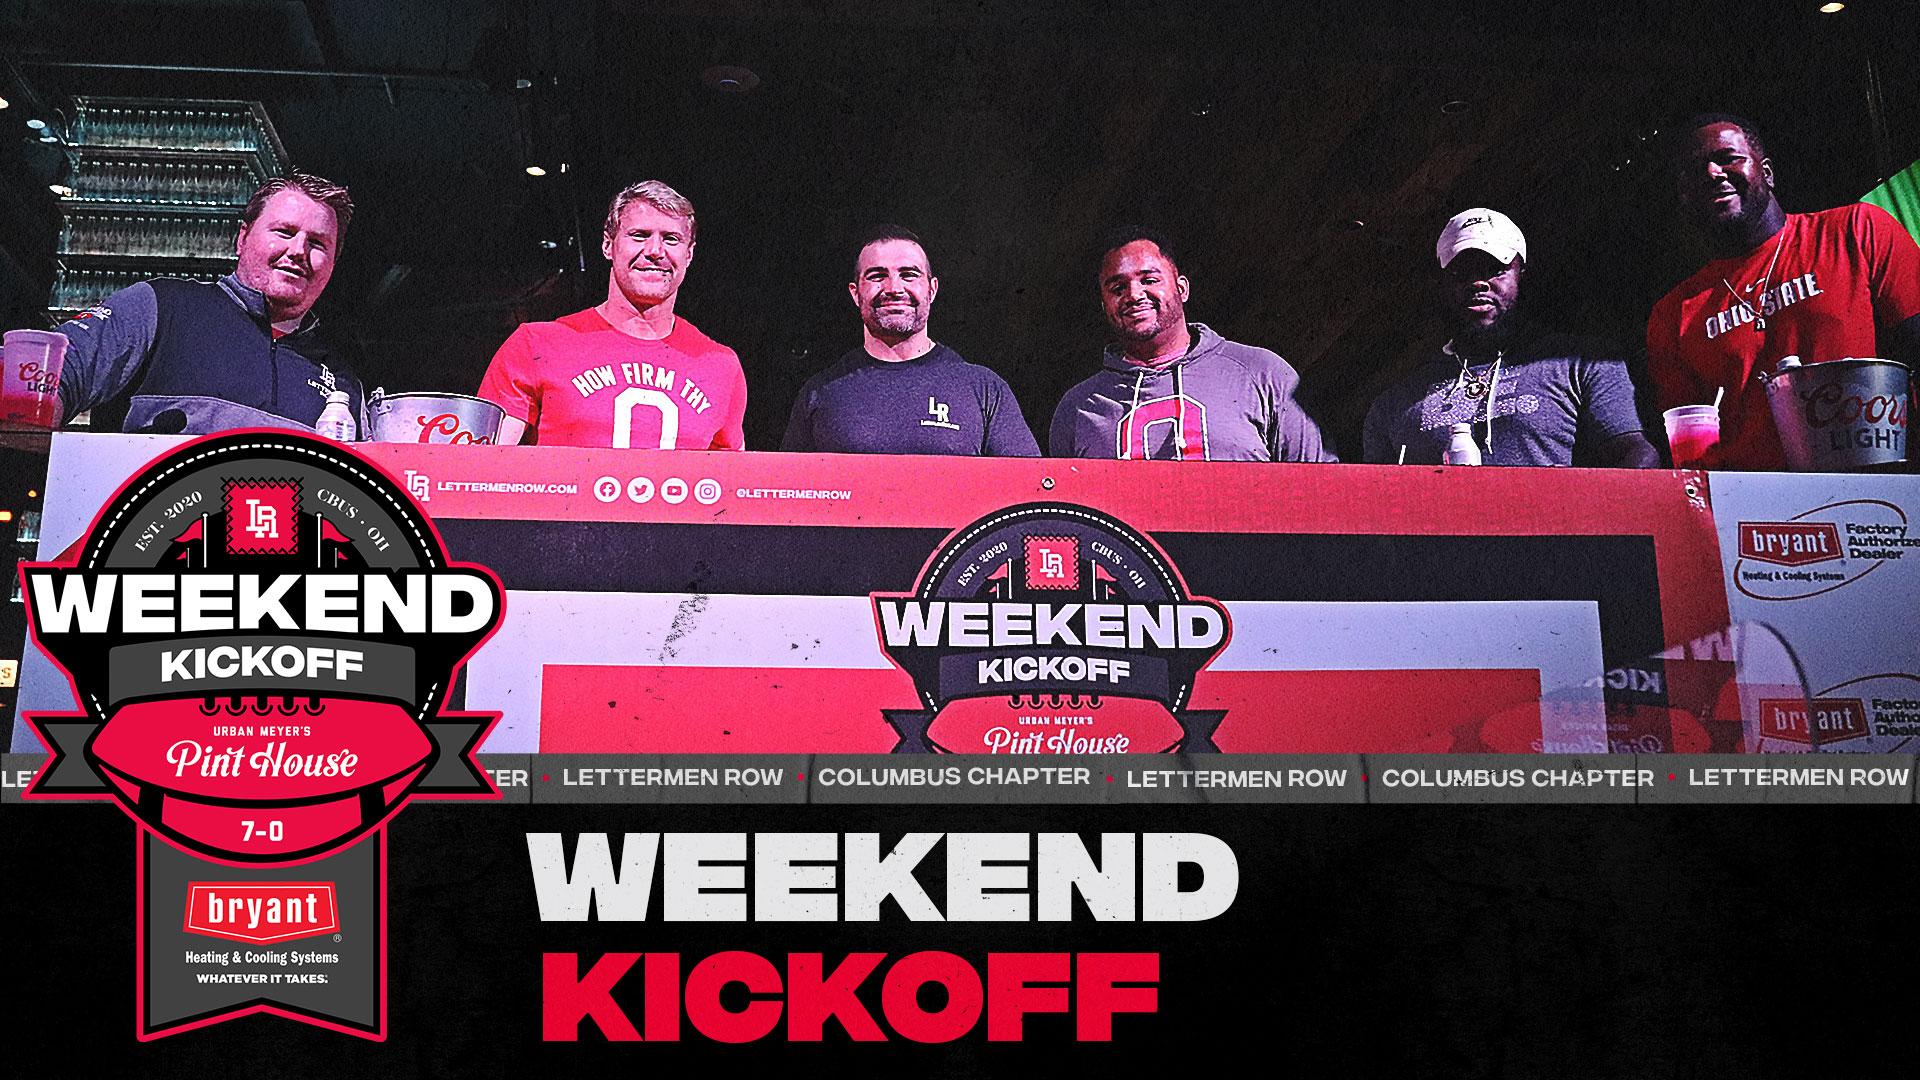 Weekend-Kickoff-featured-image-nov-5